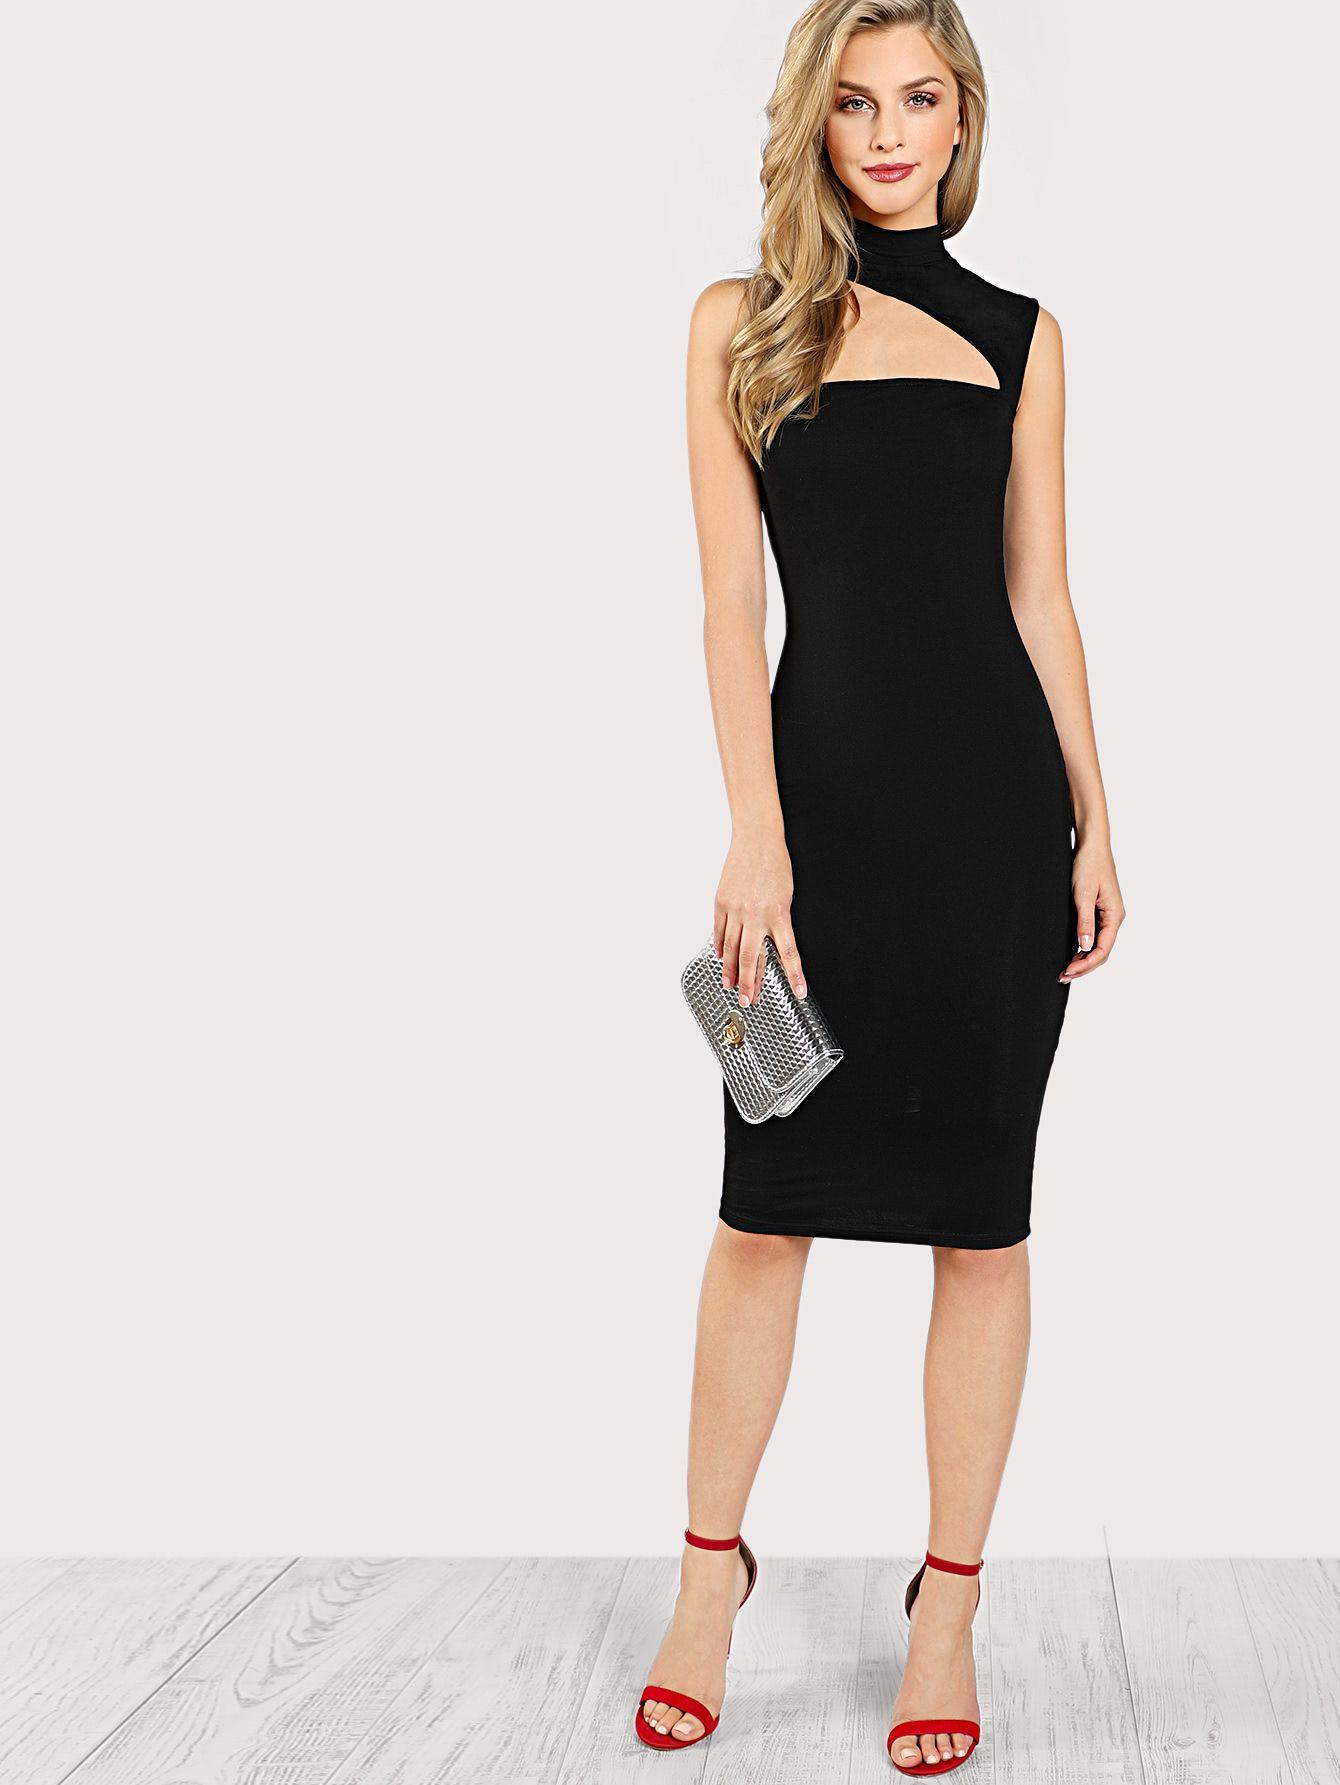 740db36986 Shop asymmetric cut out neck dress online shein offers asymmetric ...